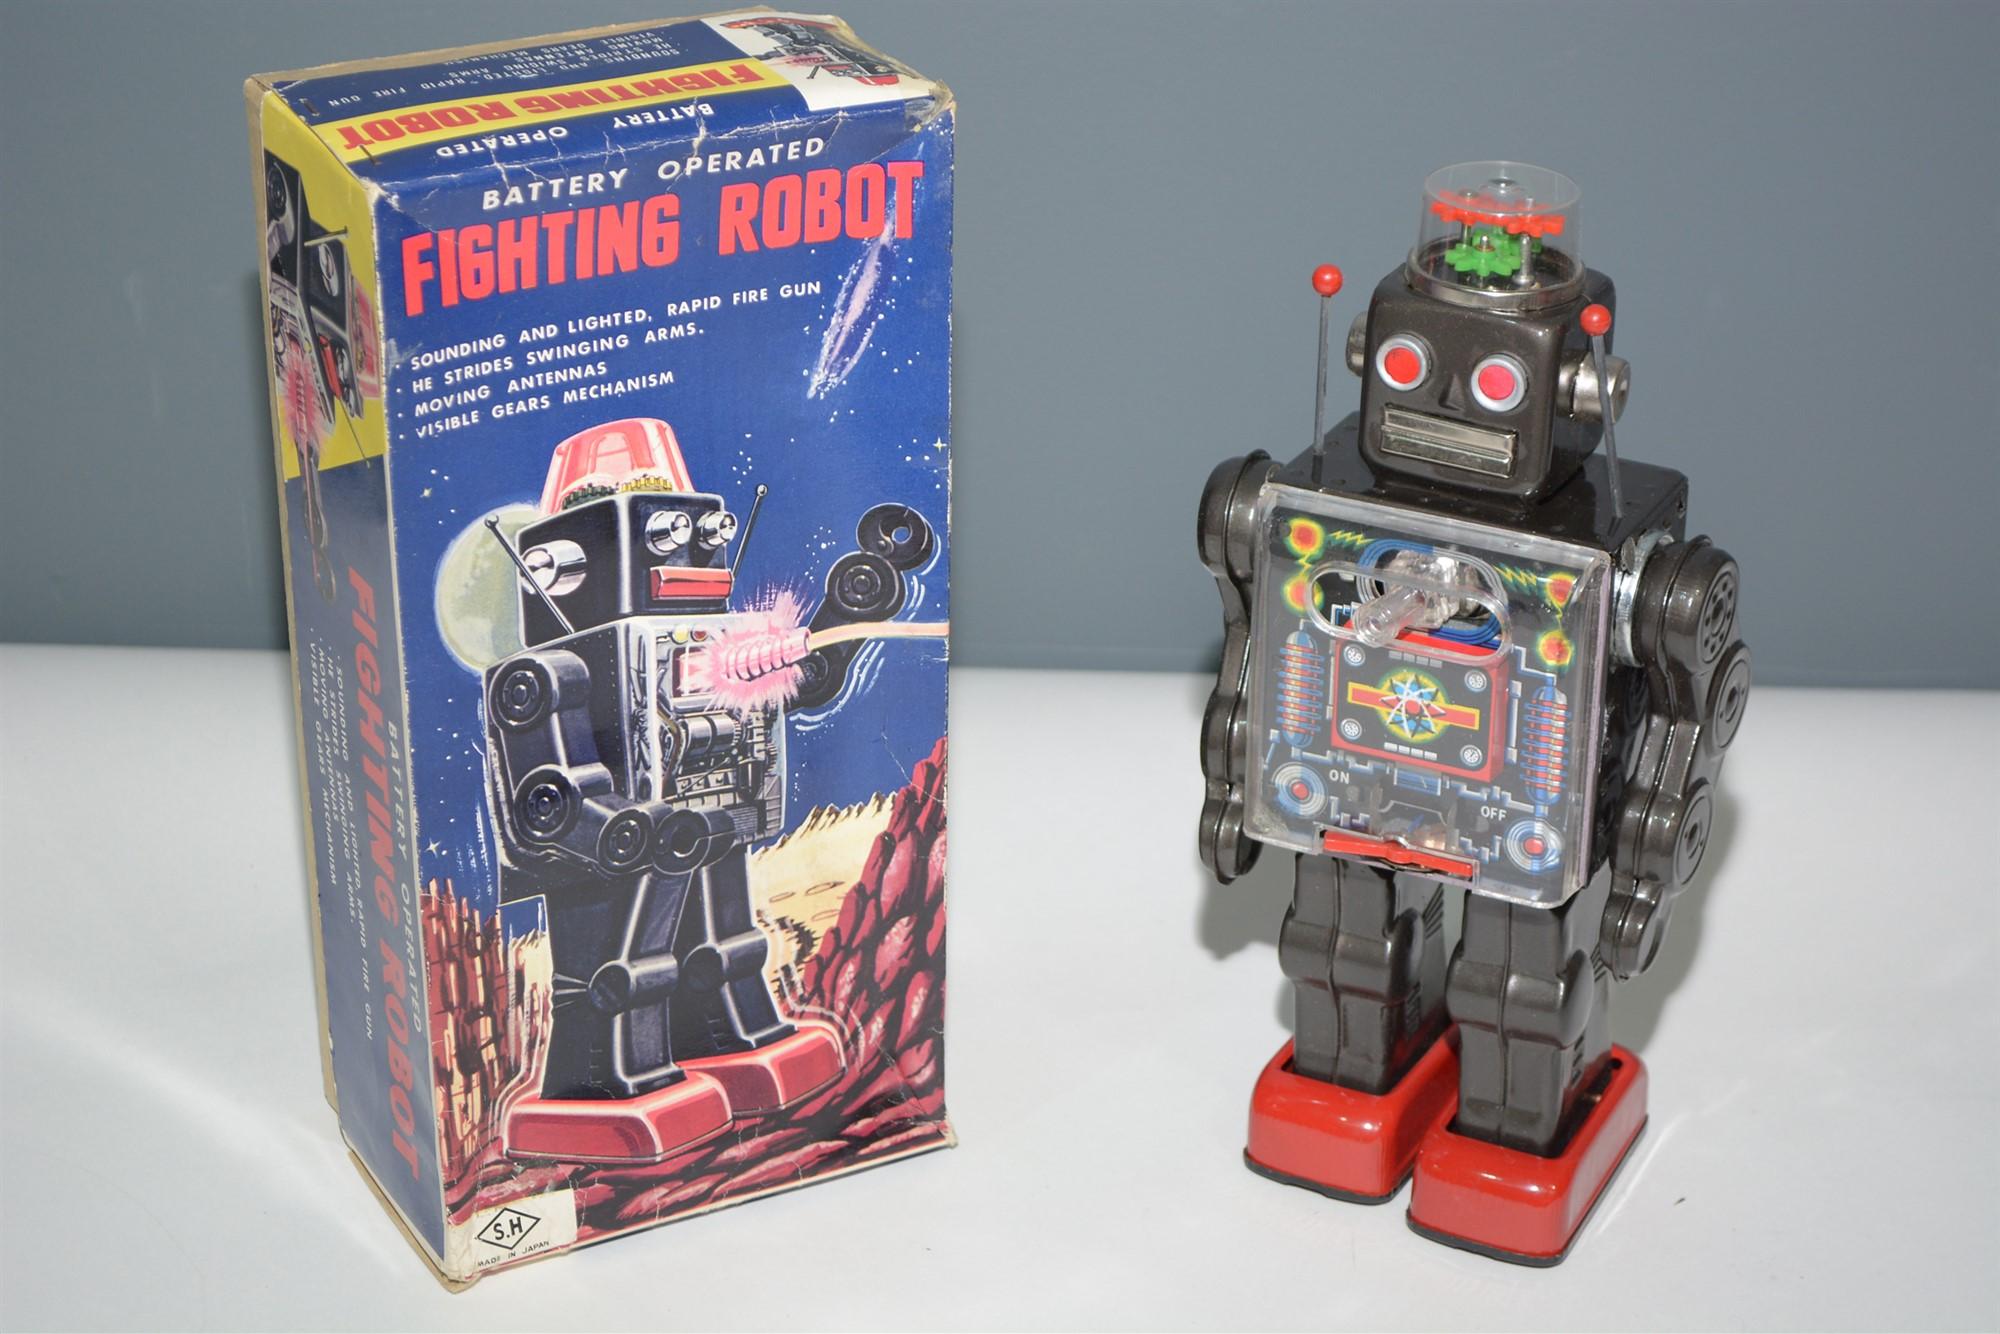 Lot 1016 - SH Horikawa Fighting Robot